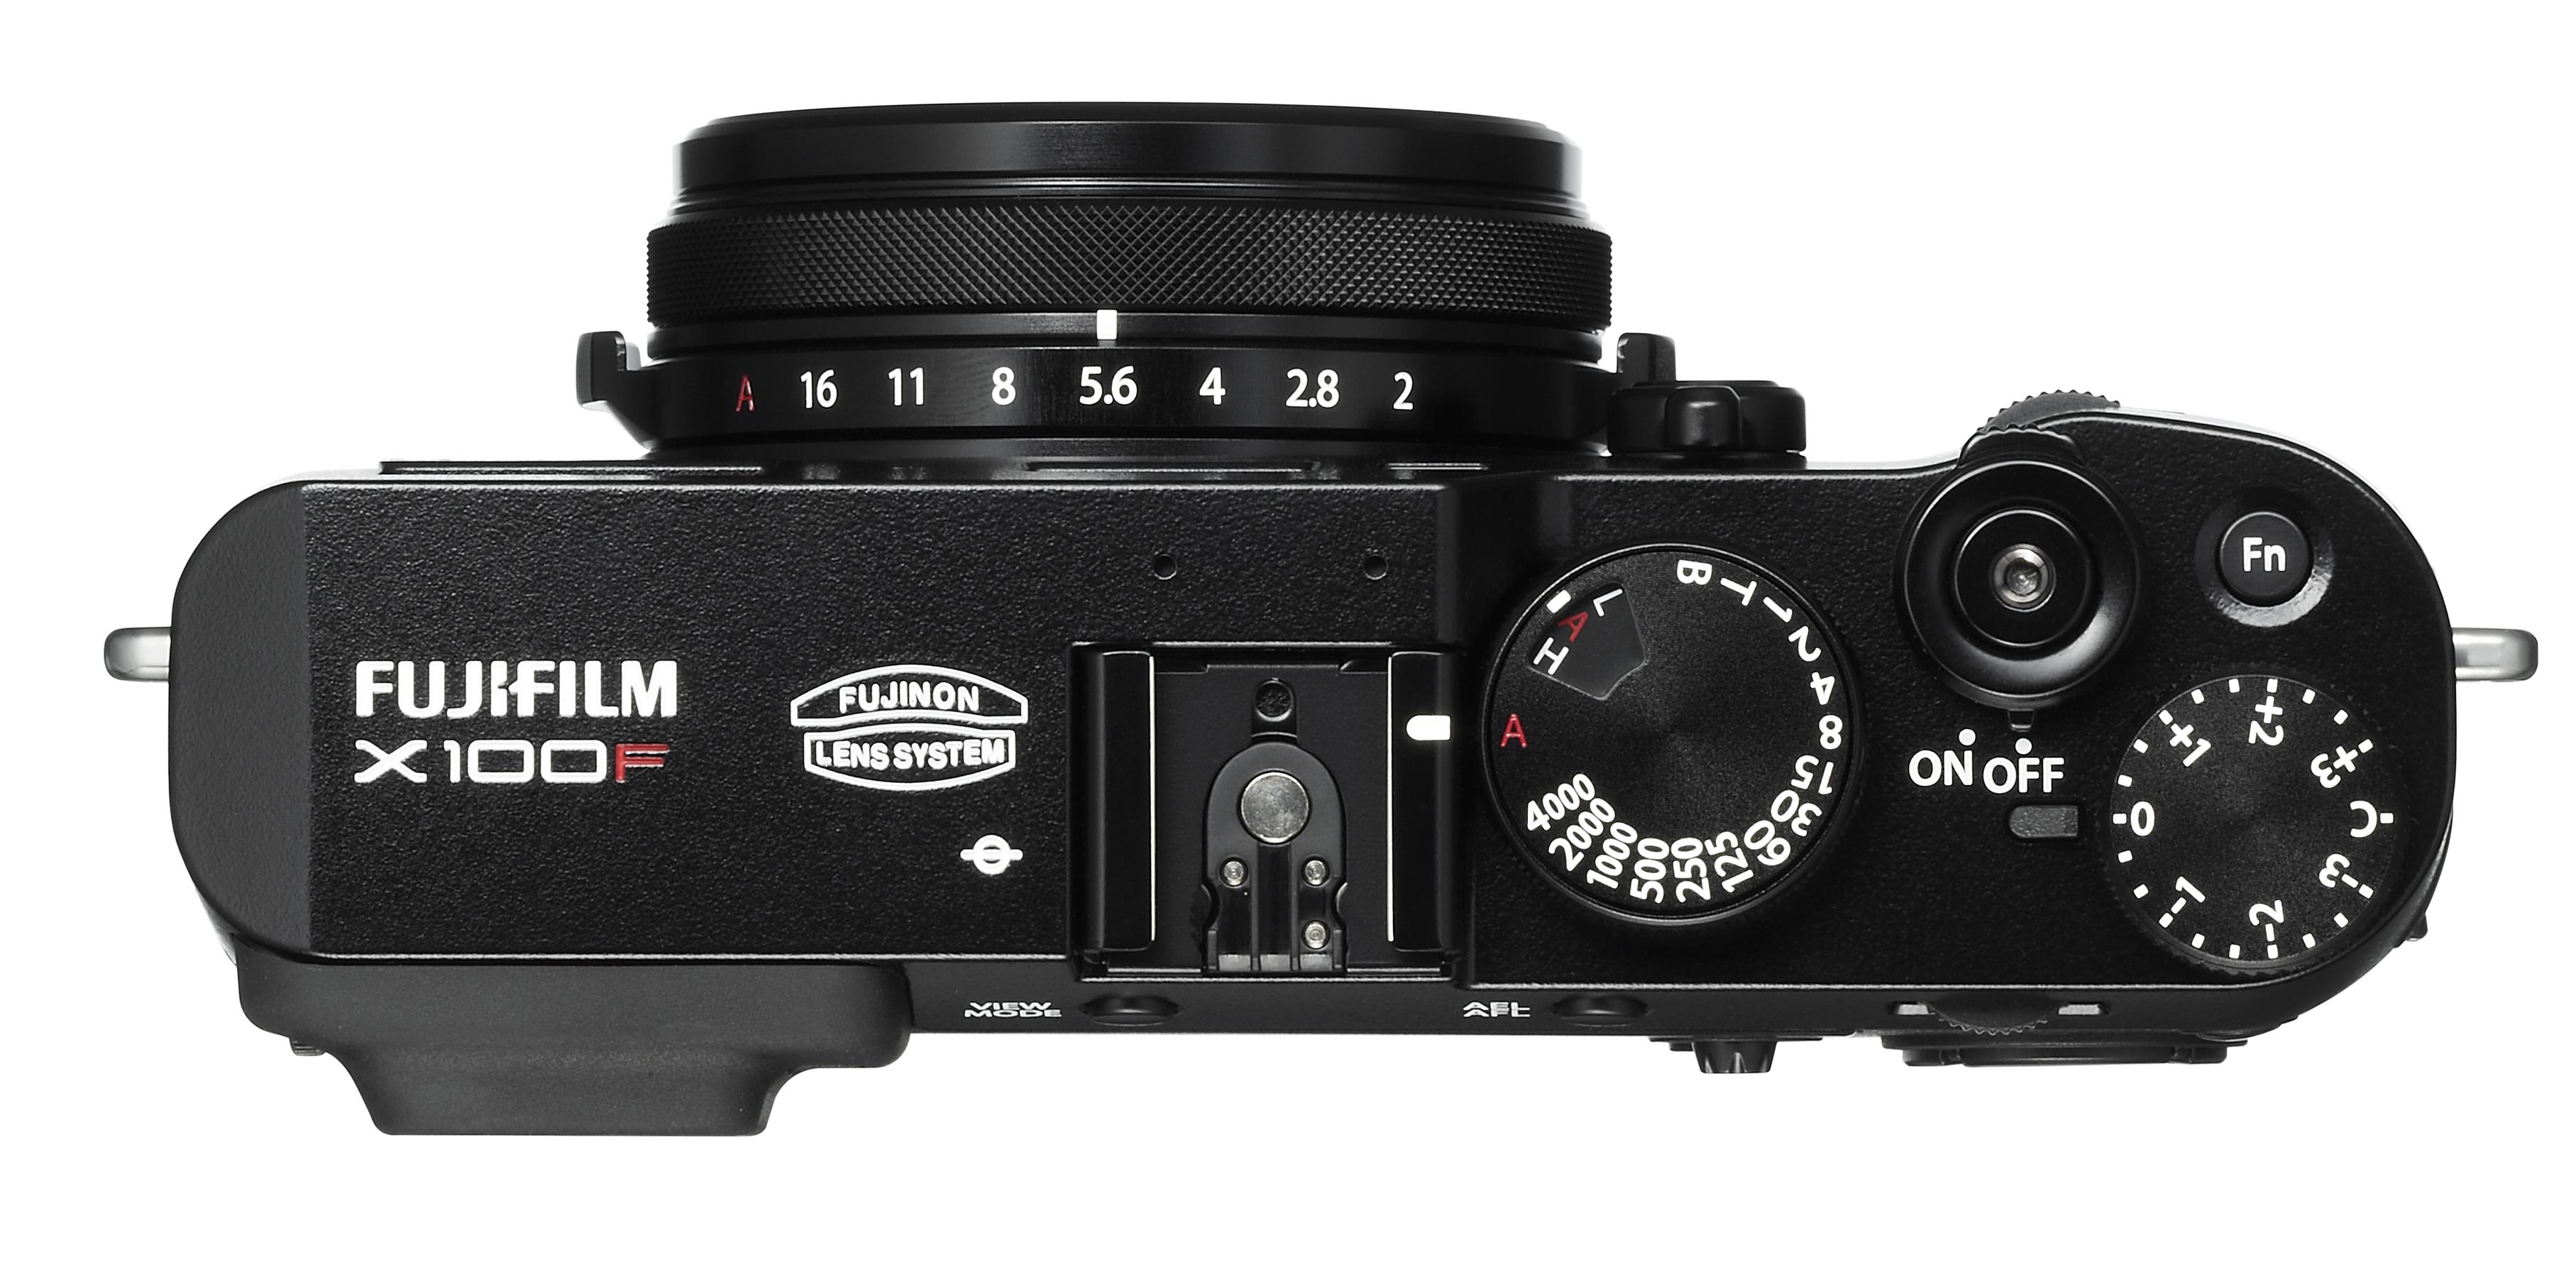 Fujifilm upgrades the sensors in its excellent midrange X